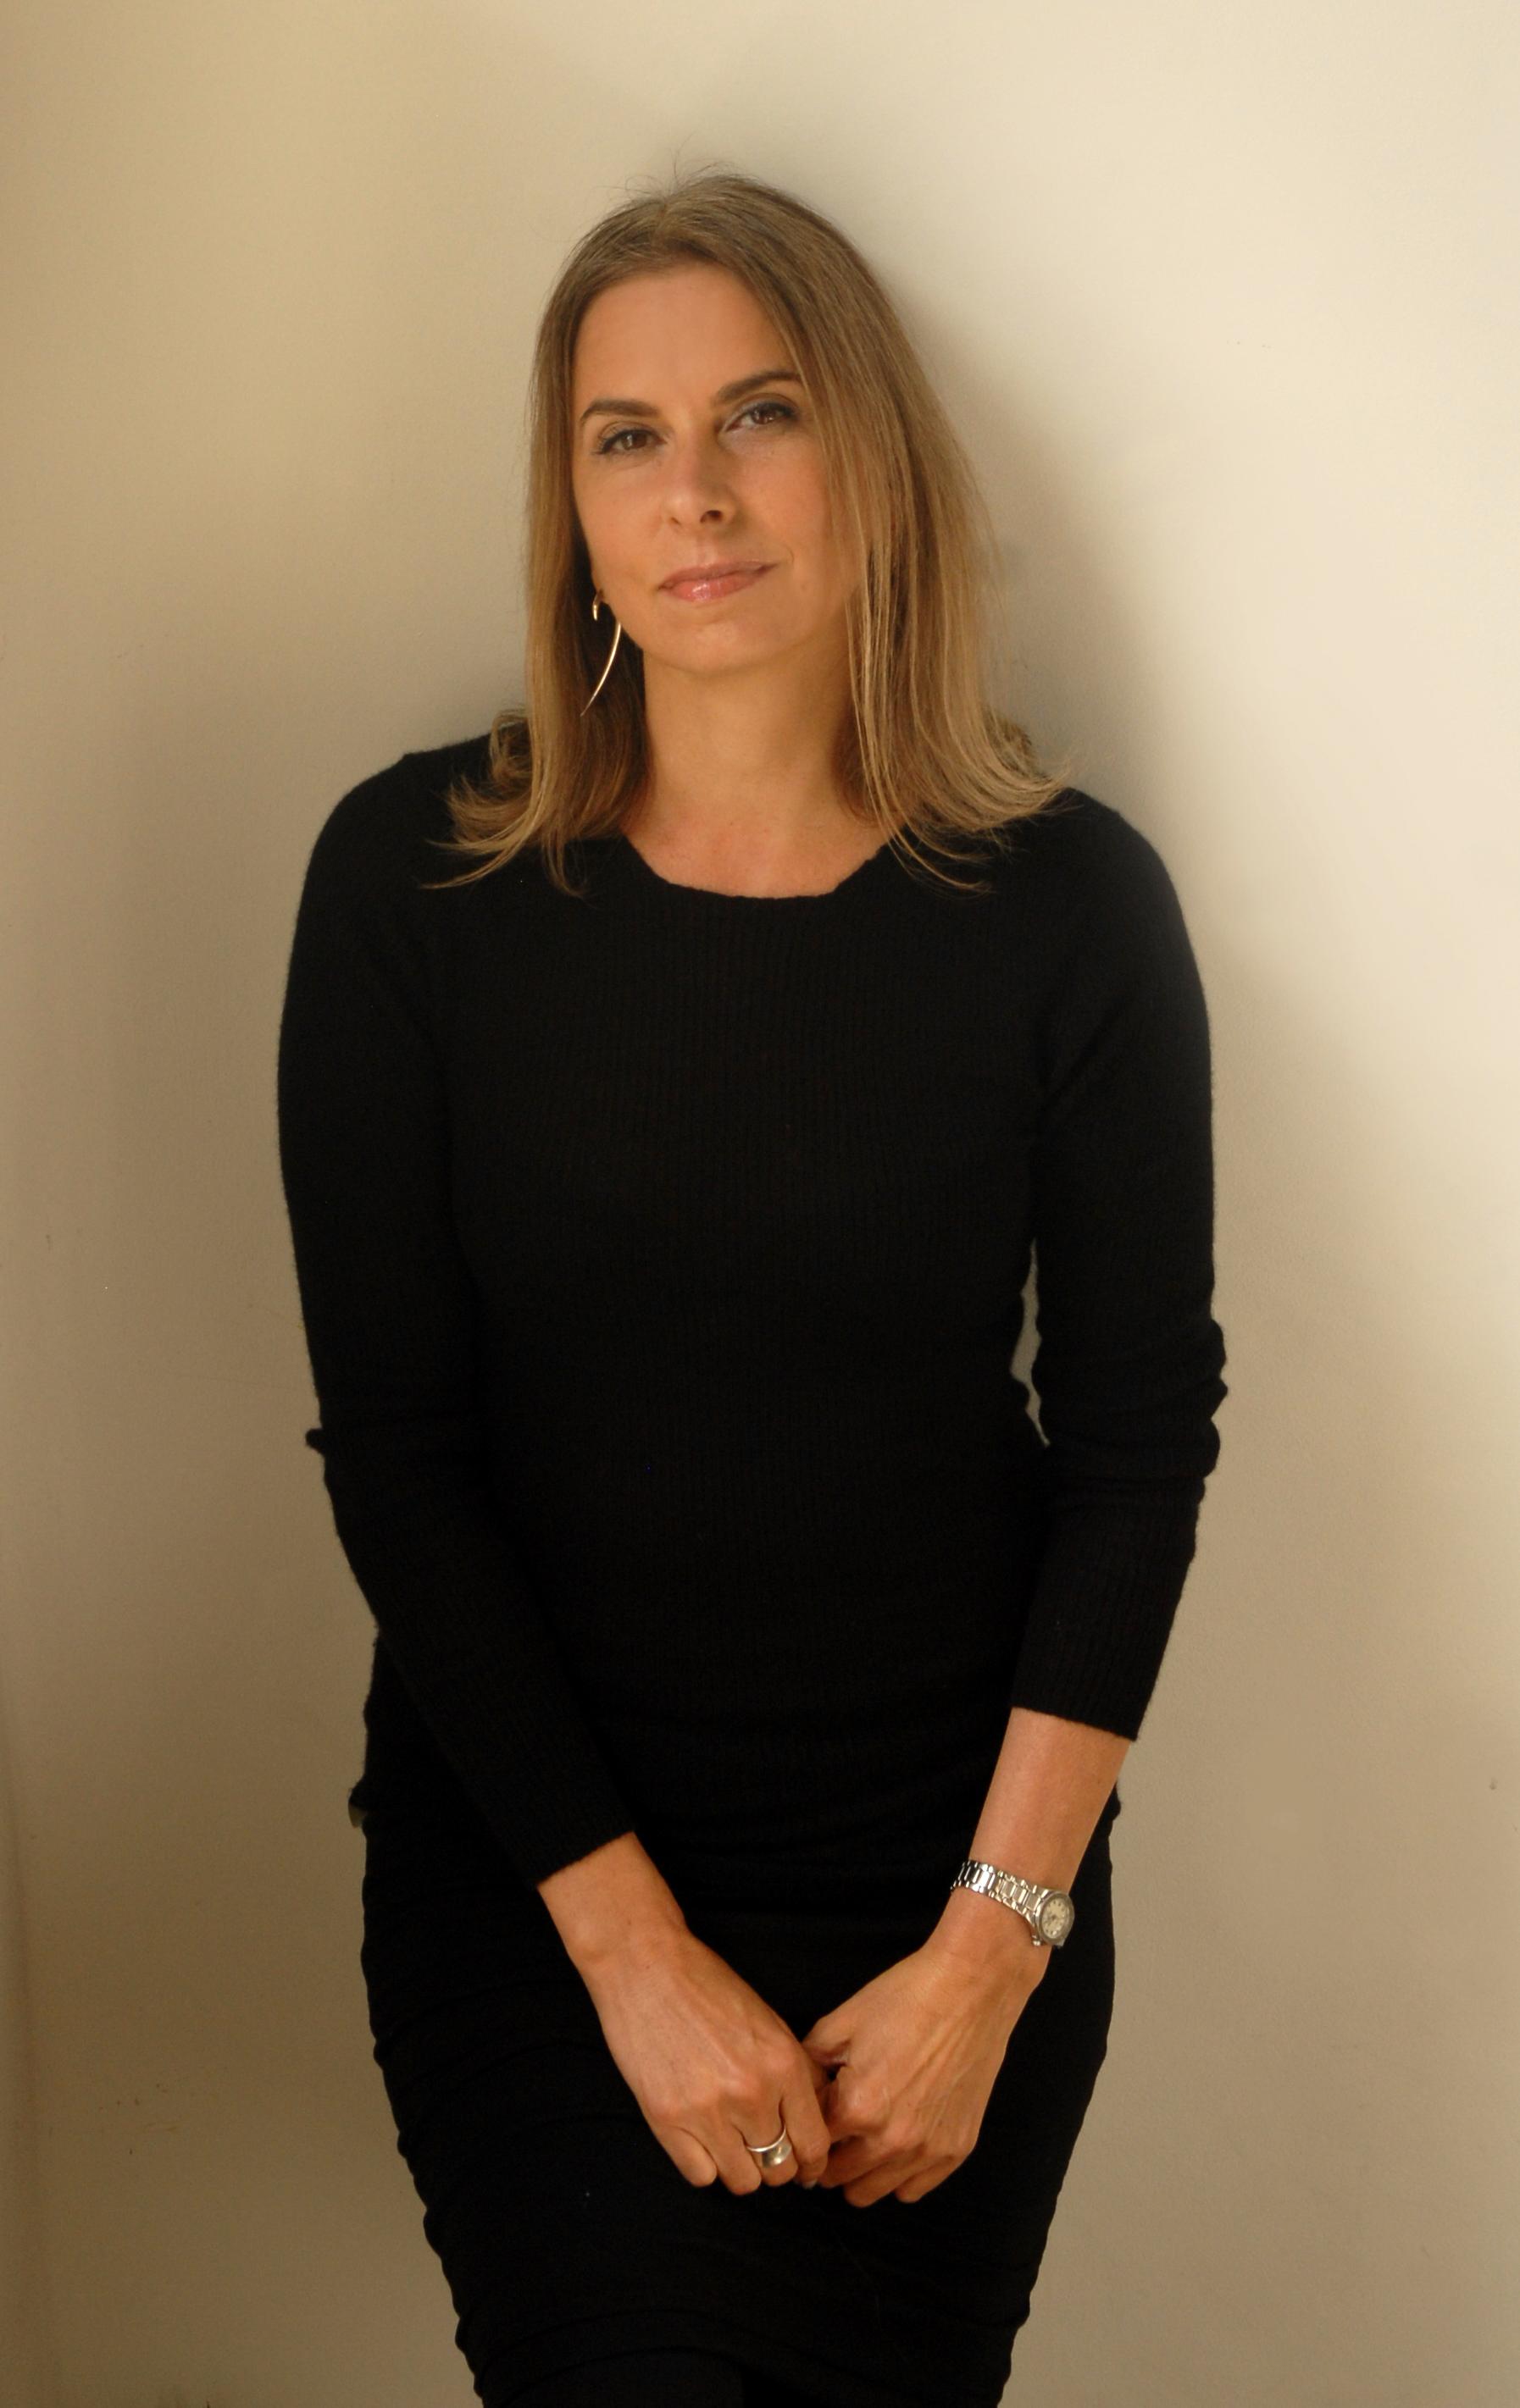 Maria Ingold - Midshot